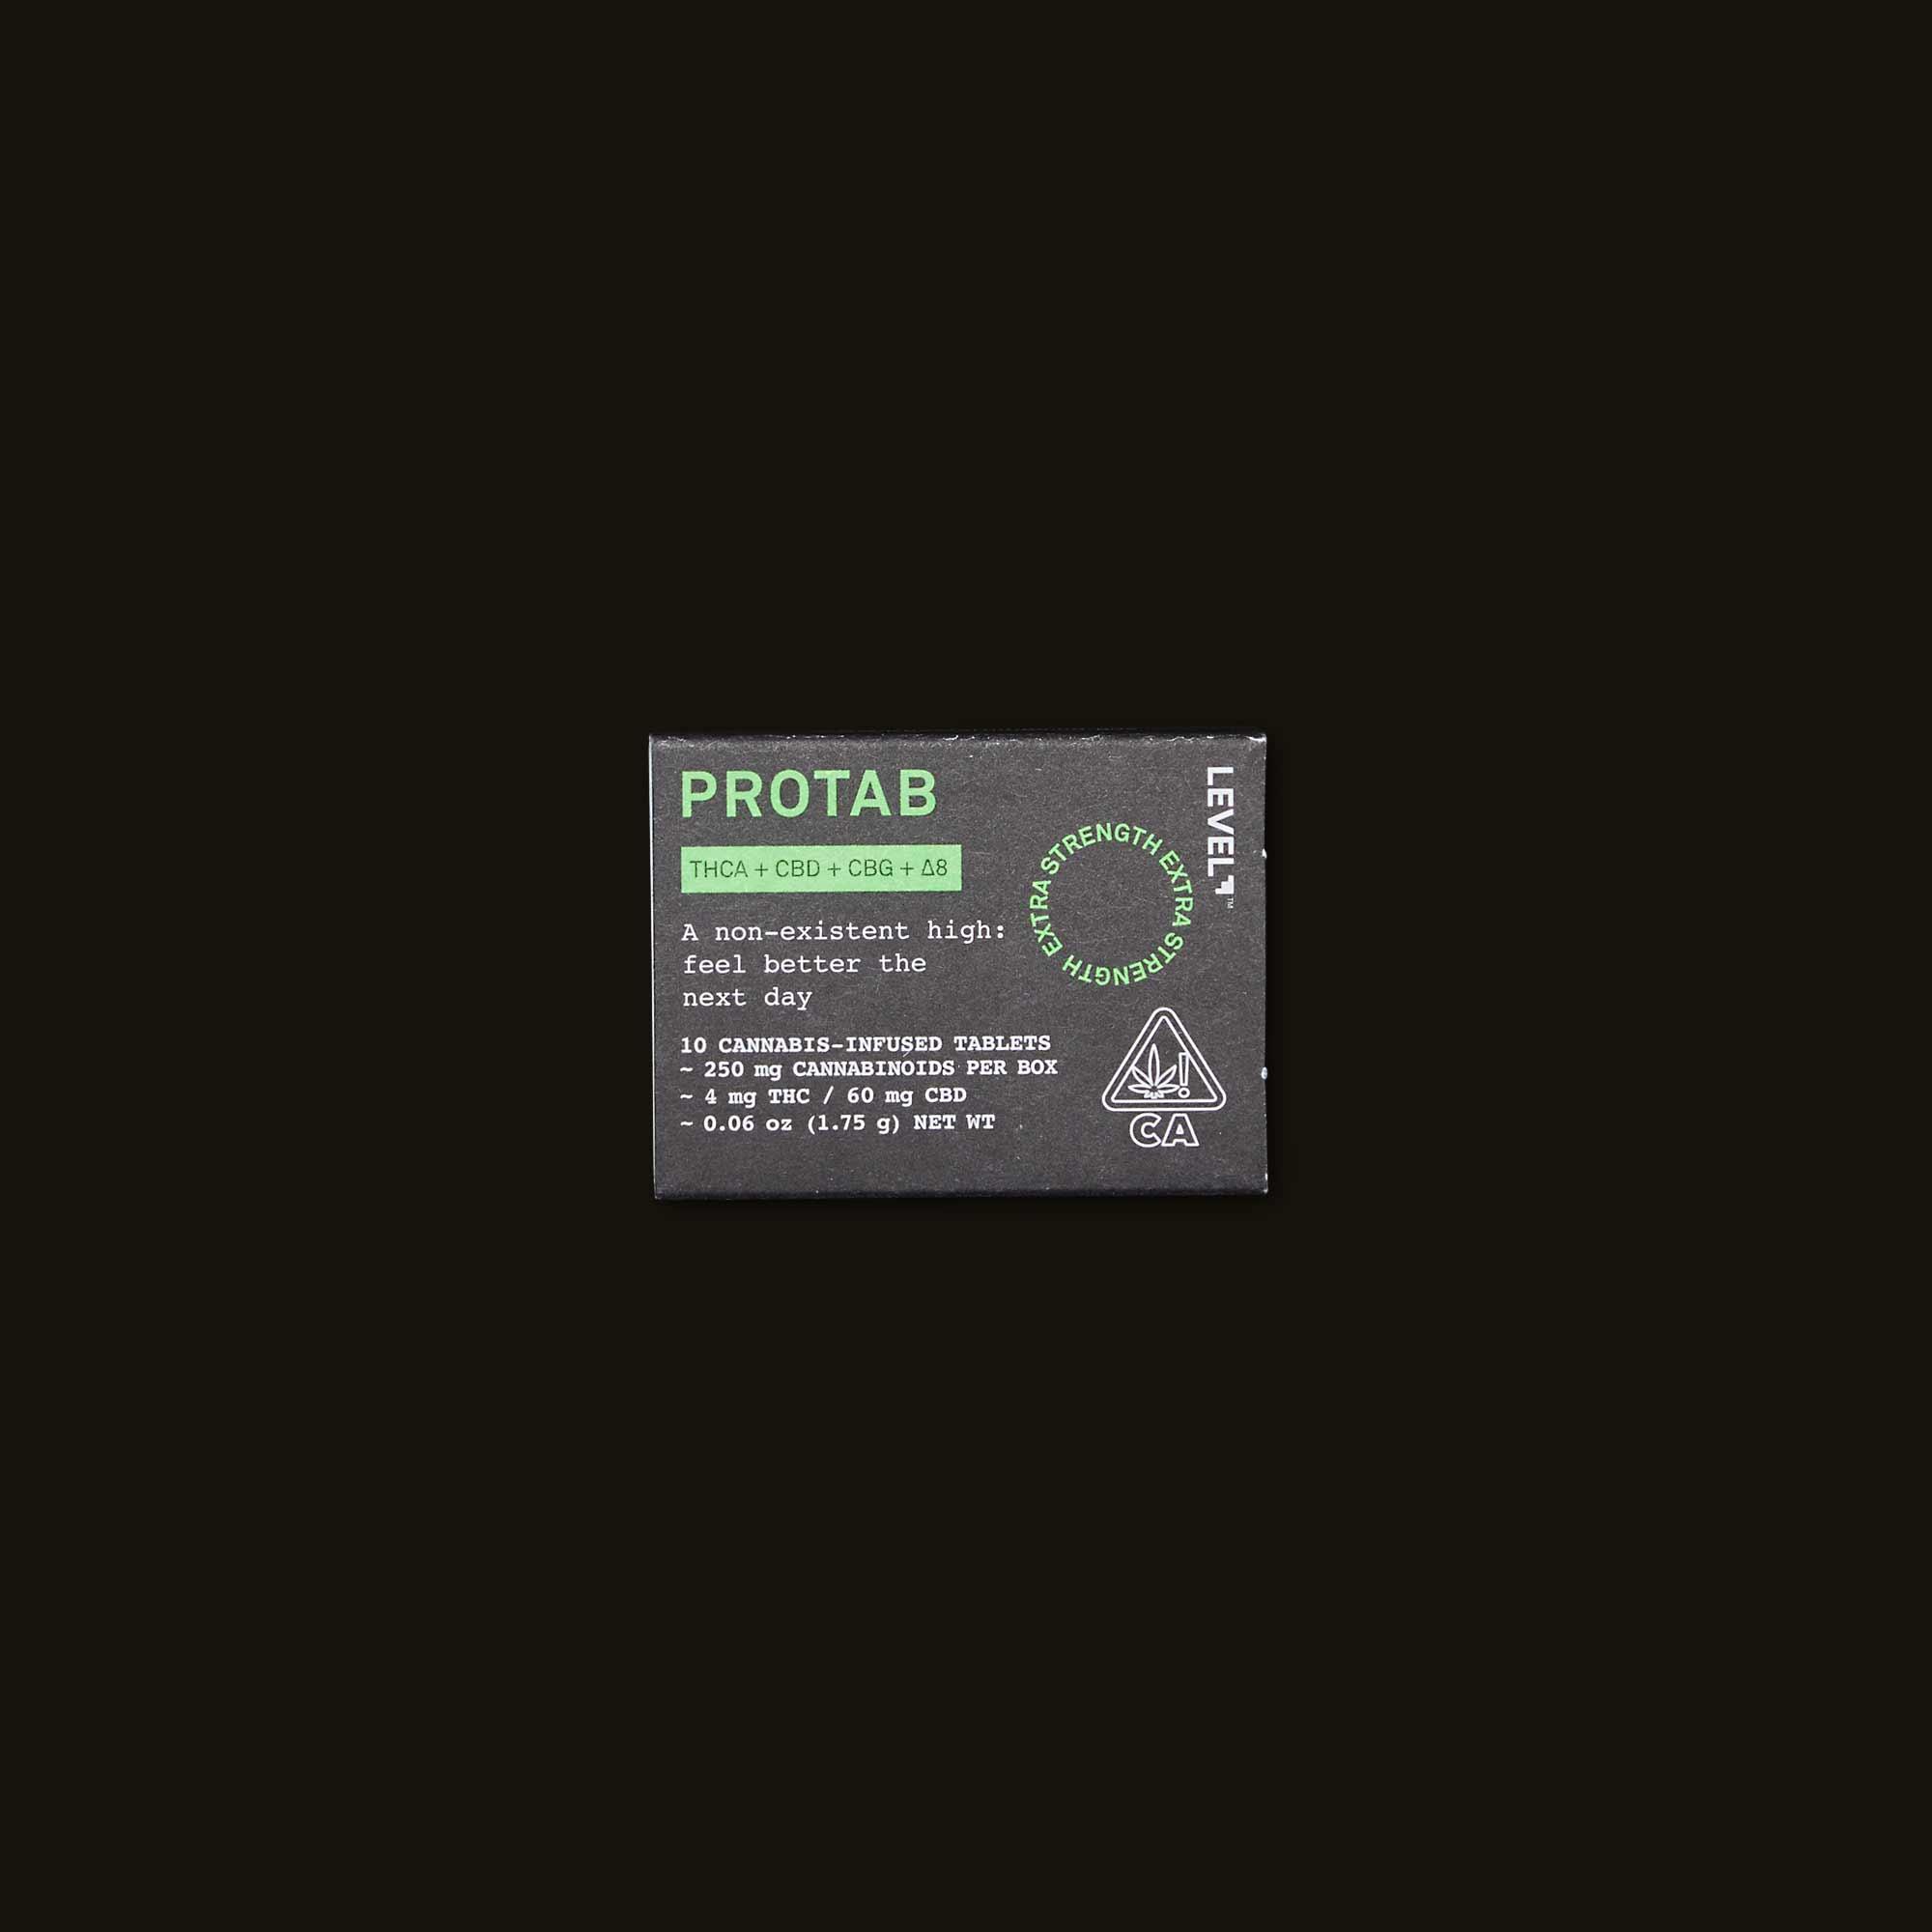 Protab THCA + CBD + CBG + ^8 Hangover Pills